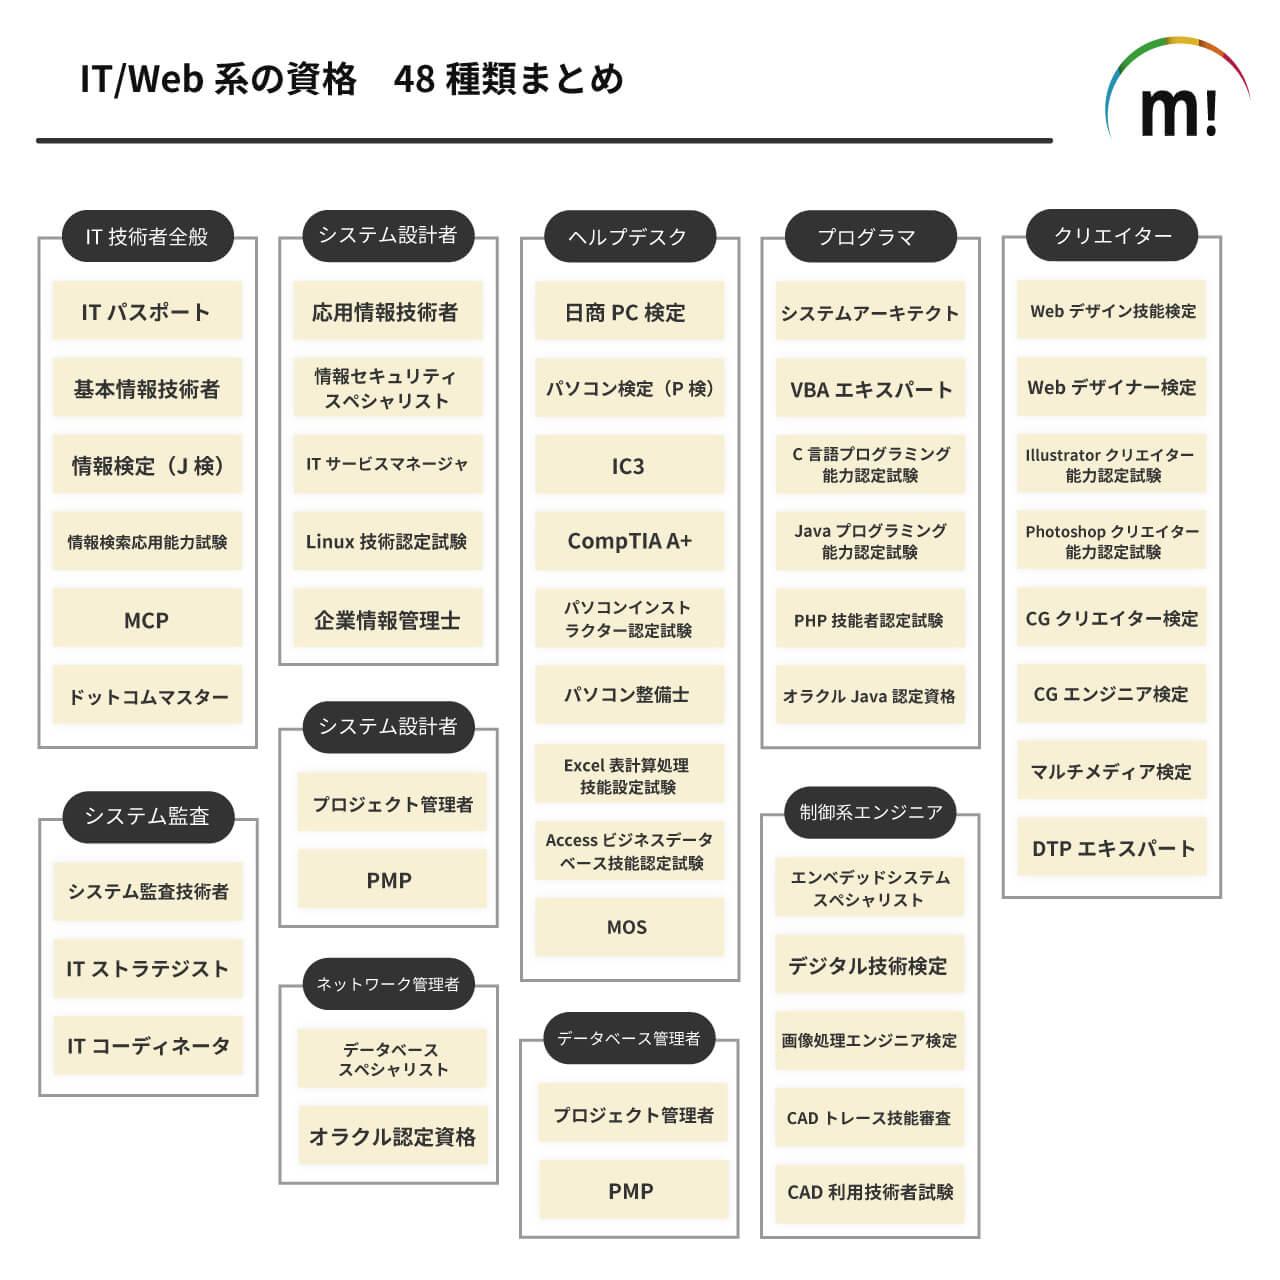 IT/Web系の資格